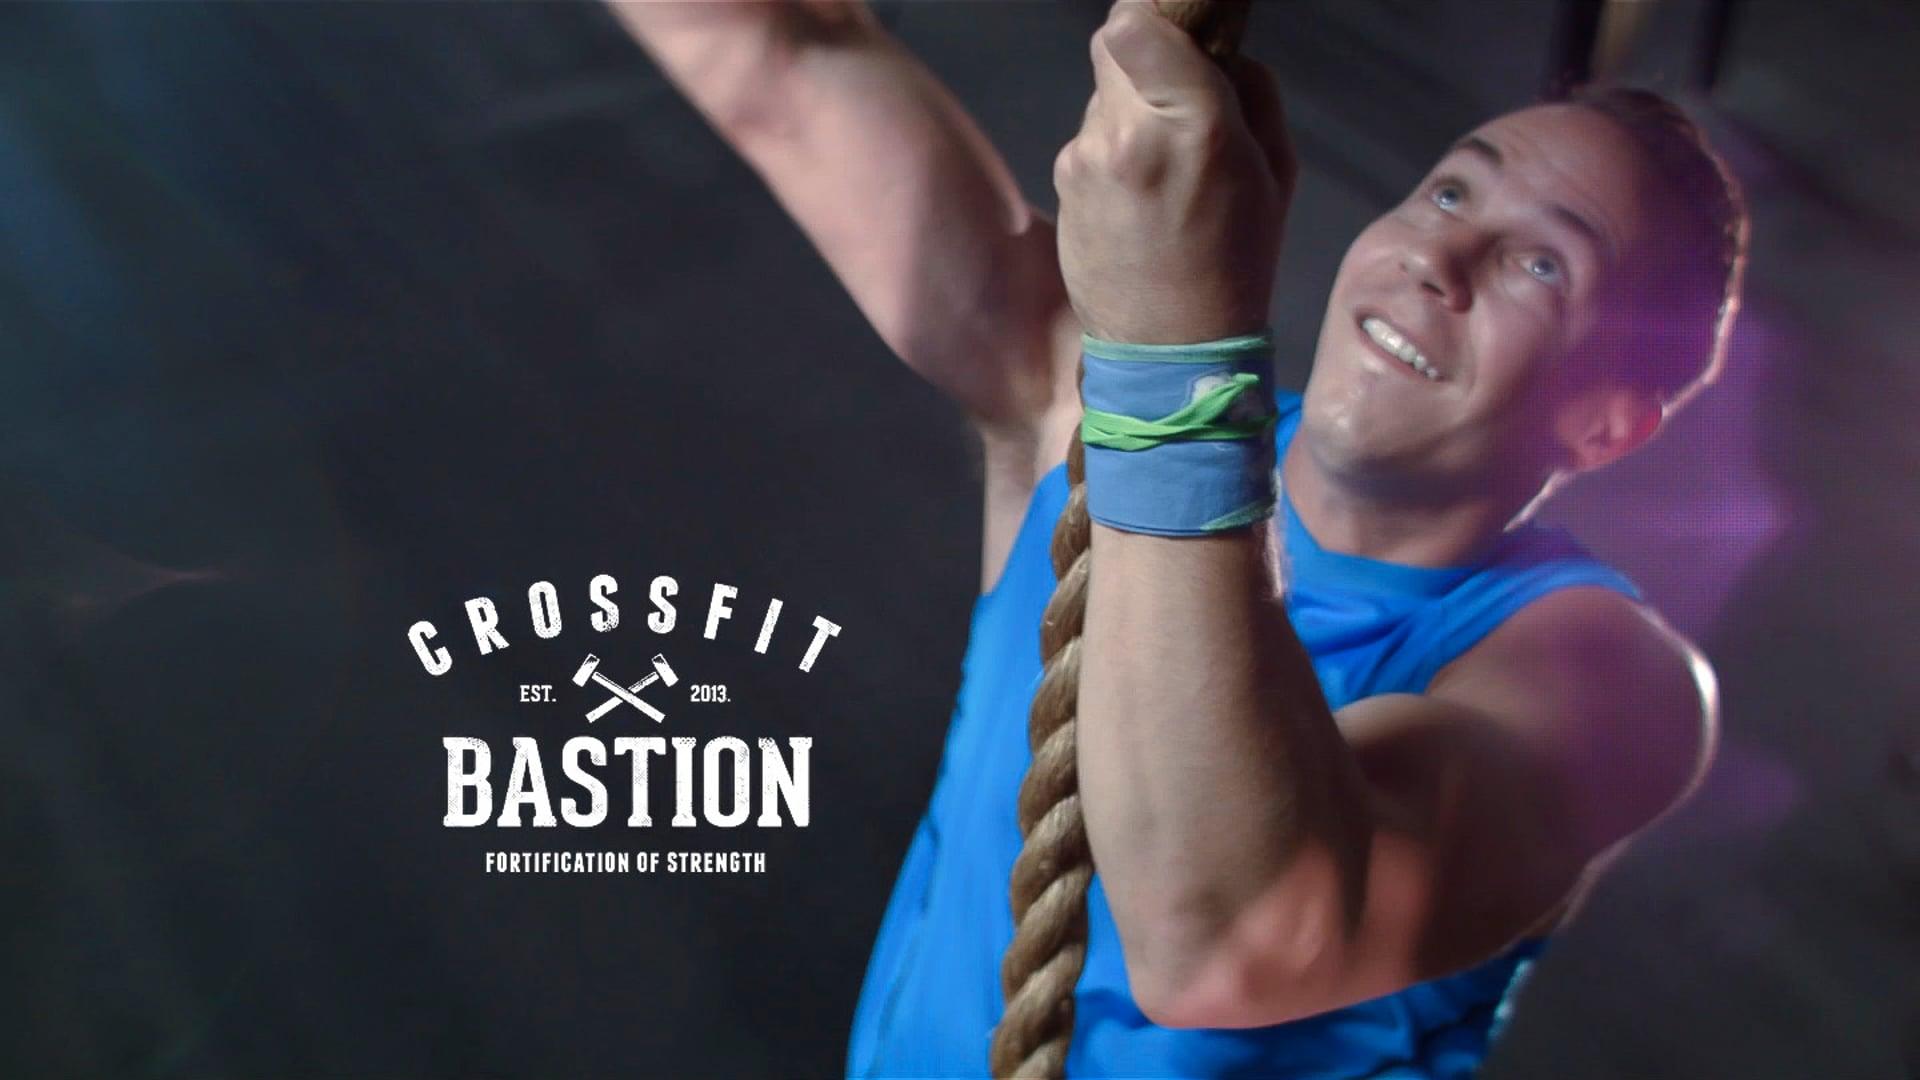 Cross Fit Bastion